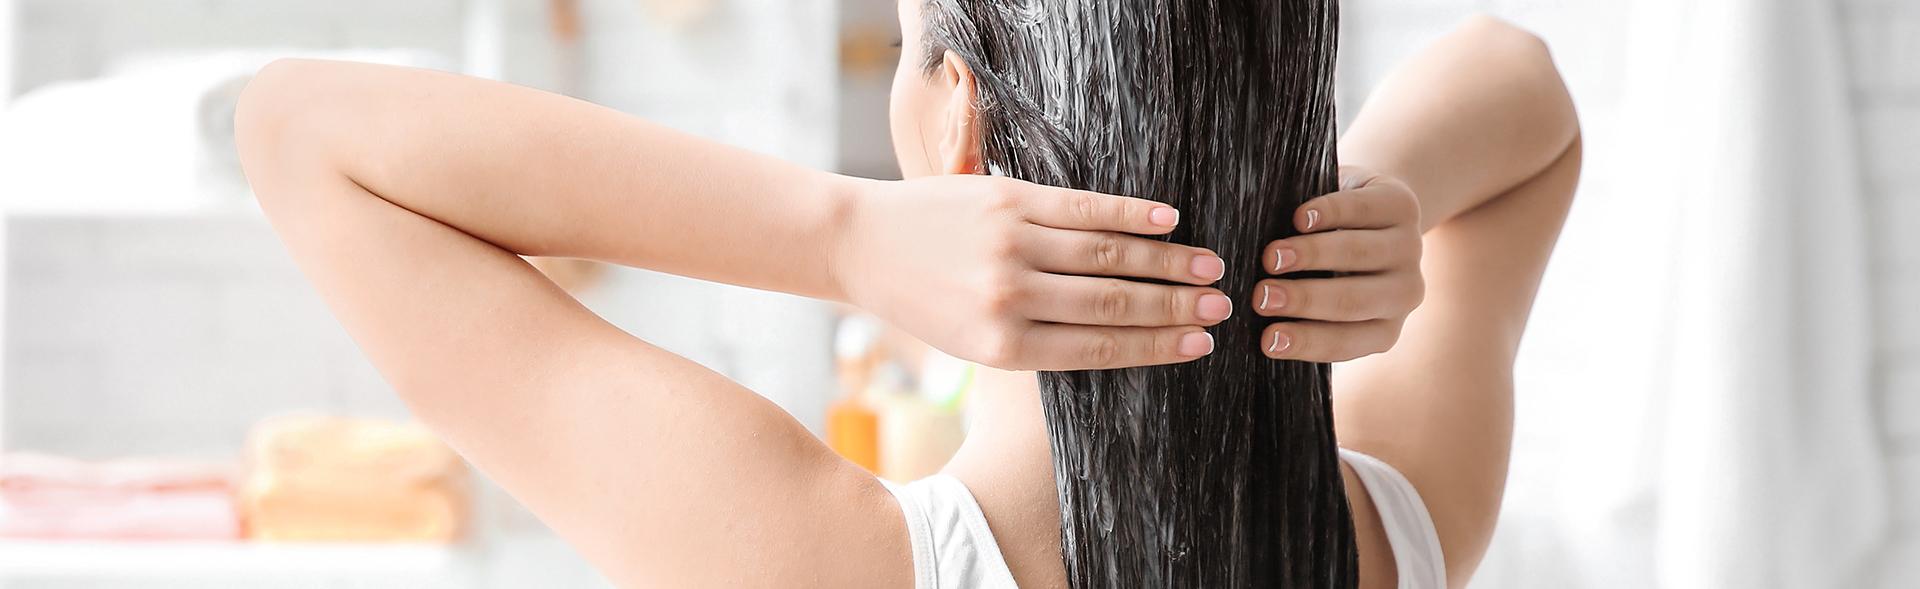 ritual-proti-vypadavani-vlasu